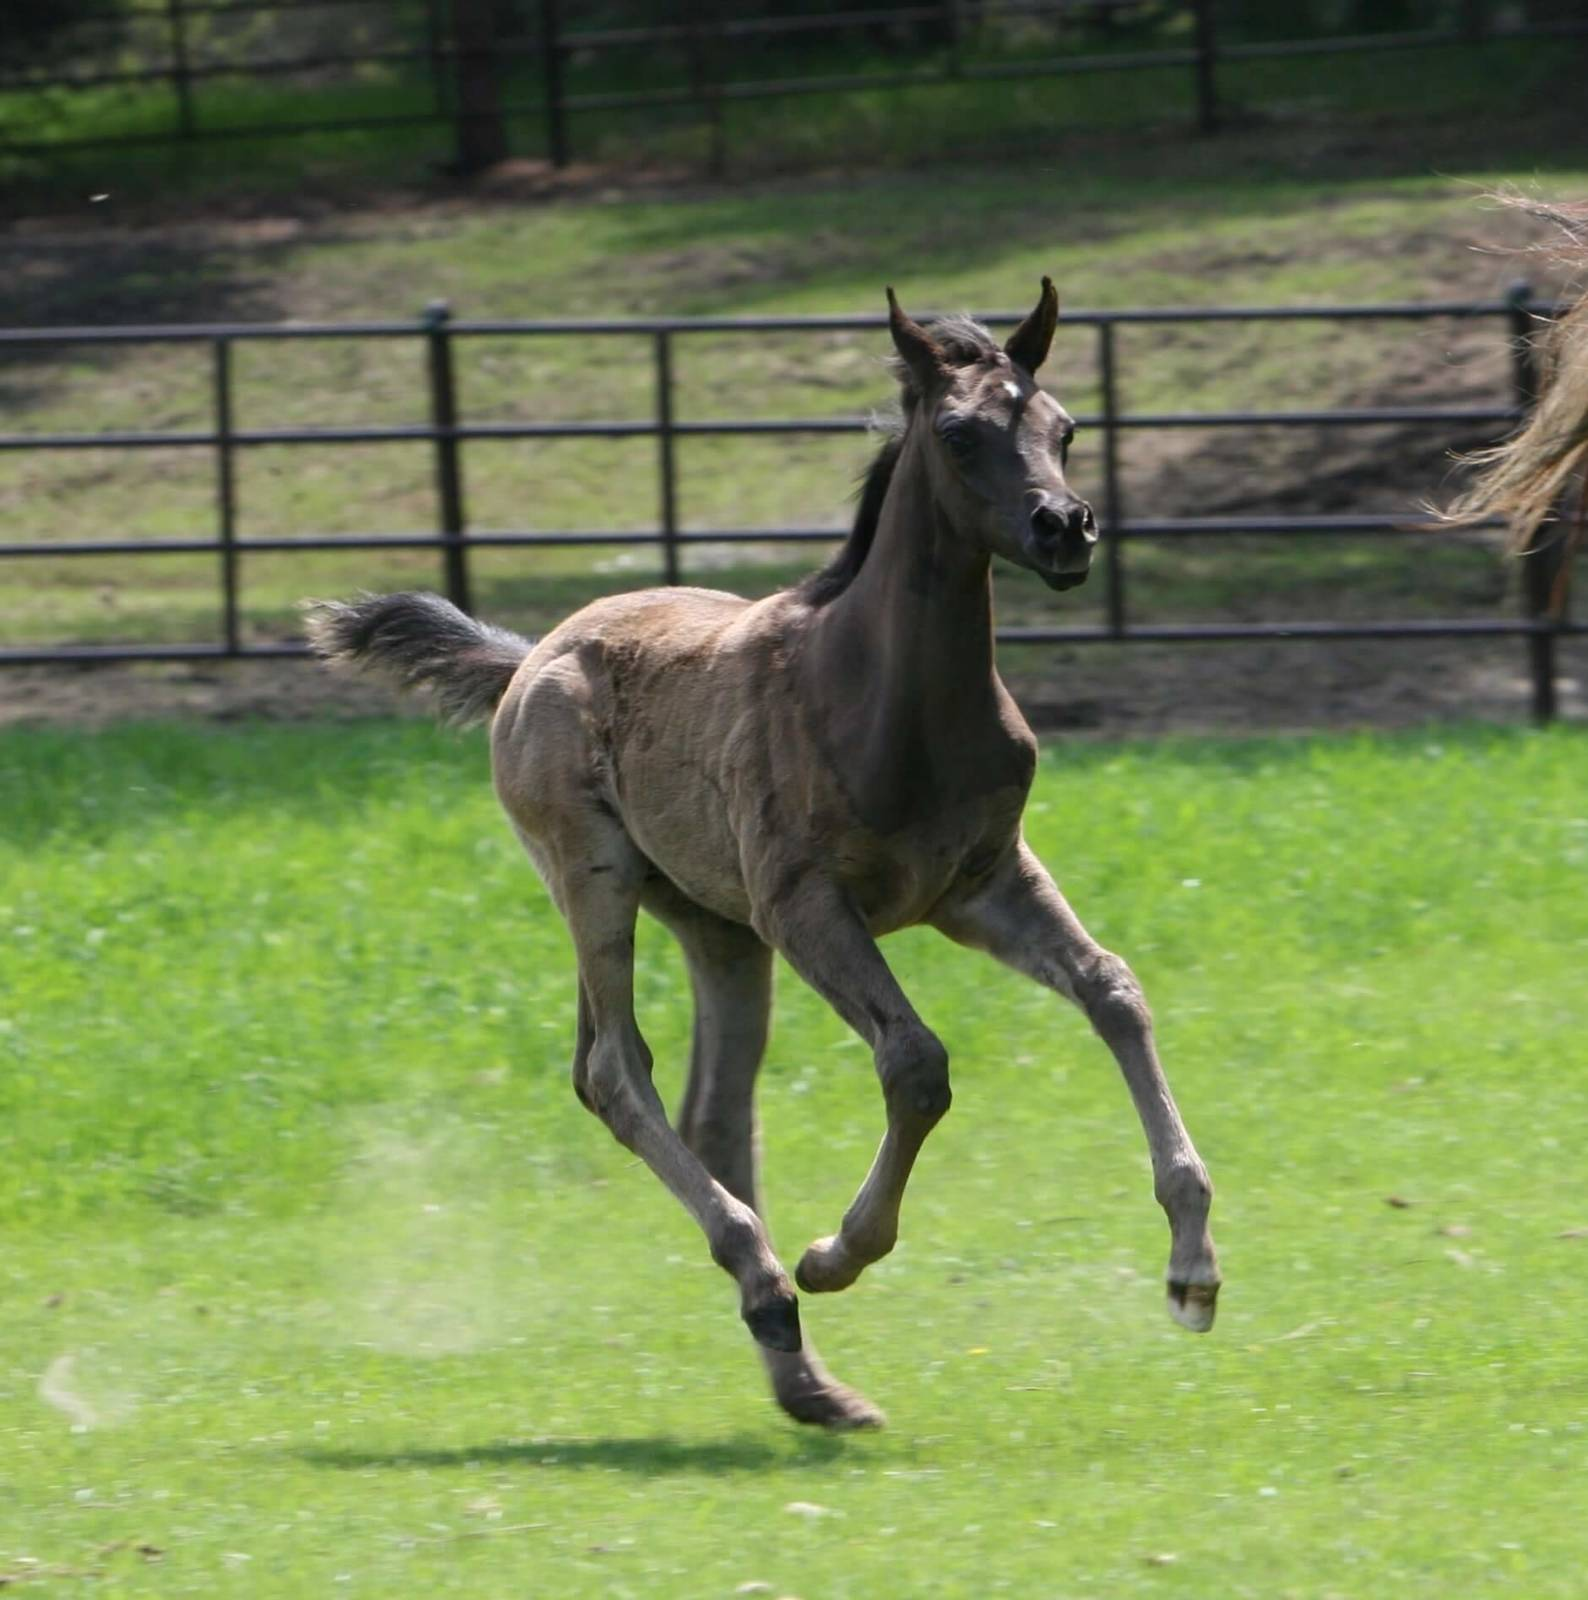 AZ Royal Emir - age 4 weeks